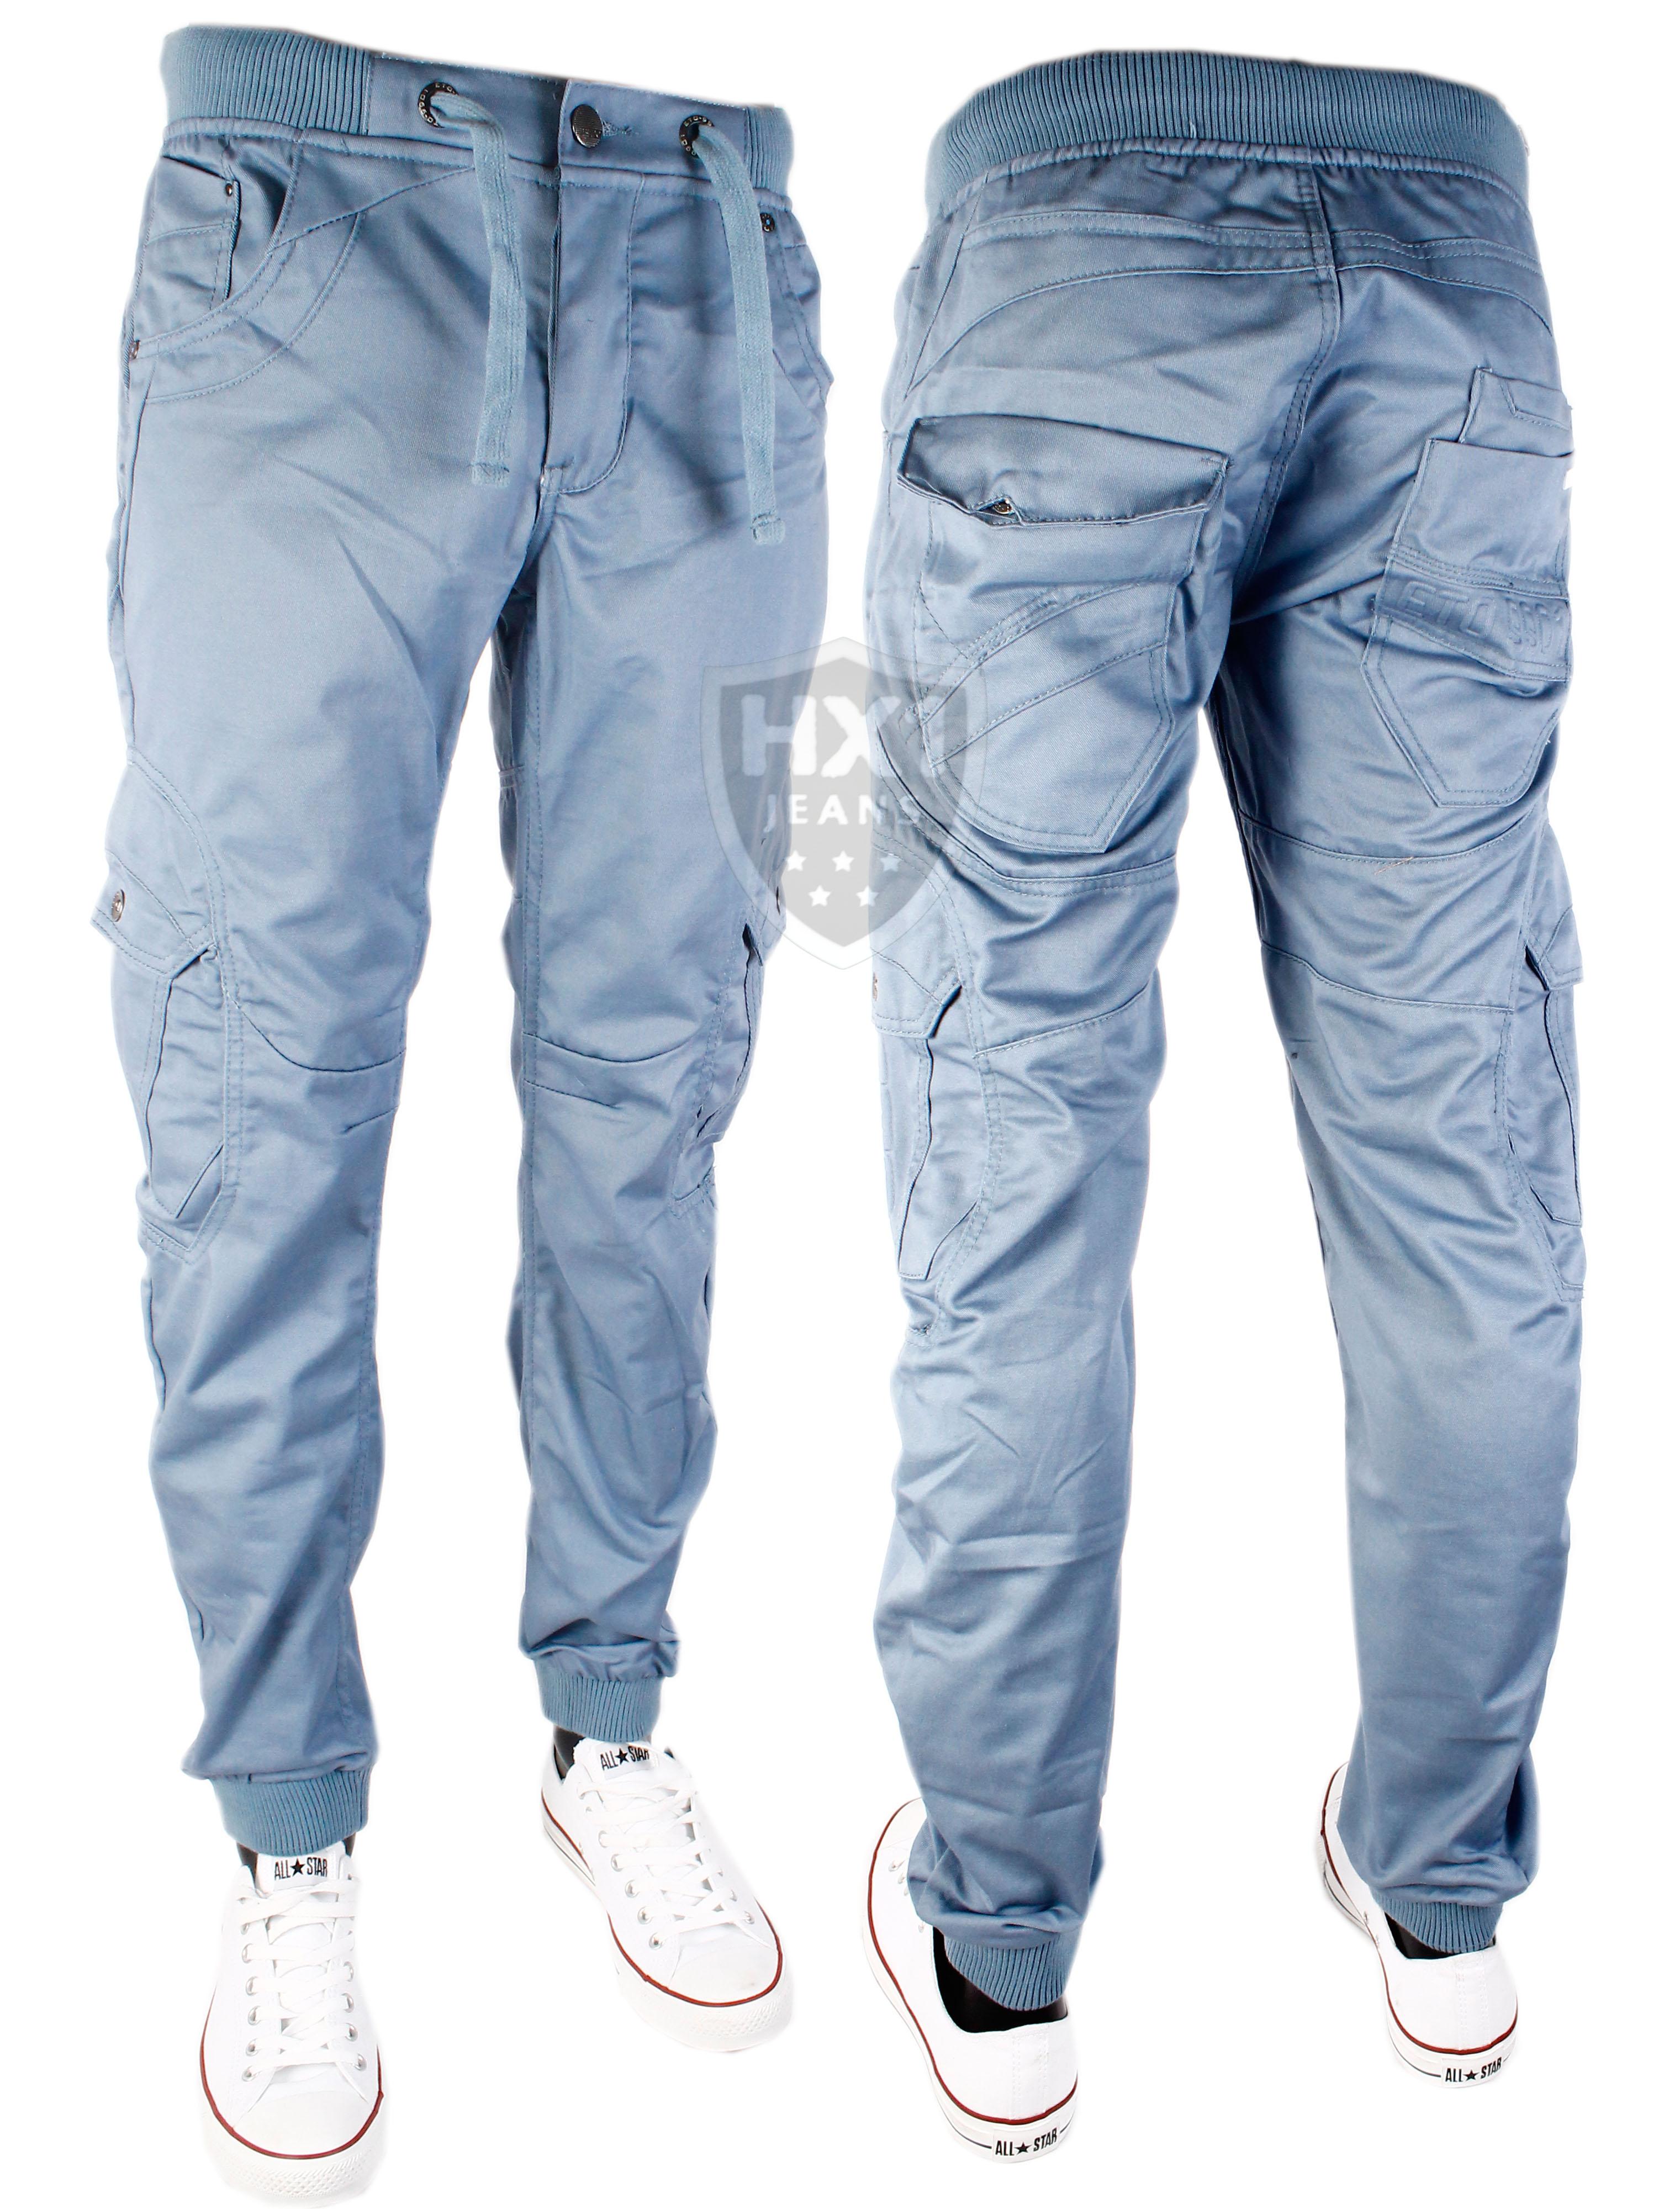 chino jeans image is loading mens-eto-em470-sky-blue-cuffed-chino-jeans- UTUXYNB